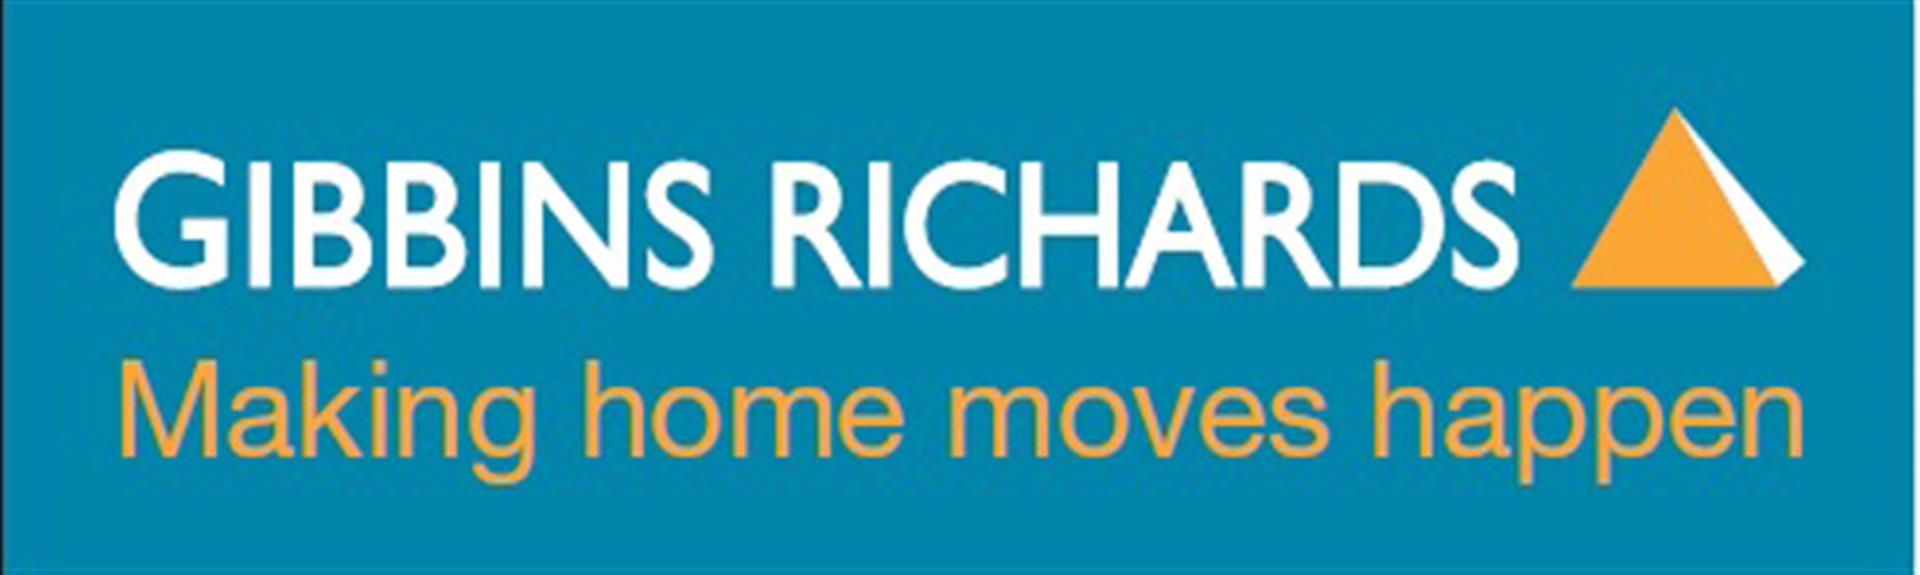 Gibbons Richards